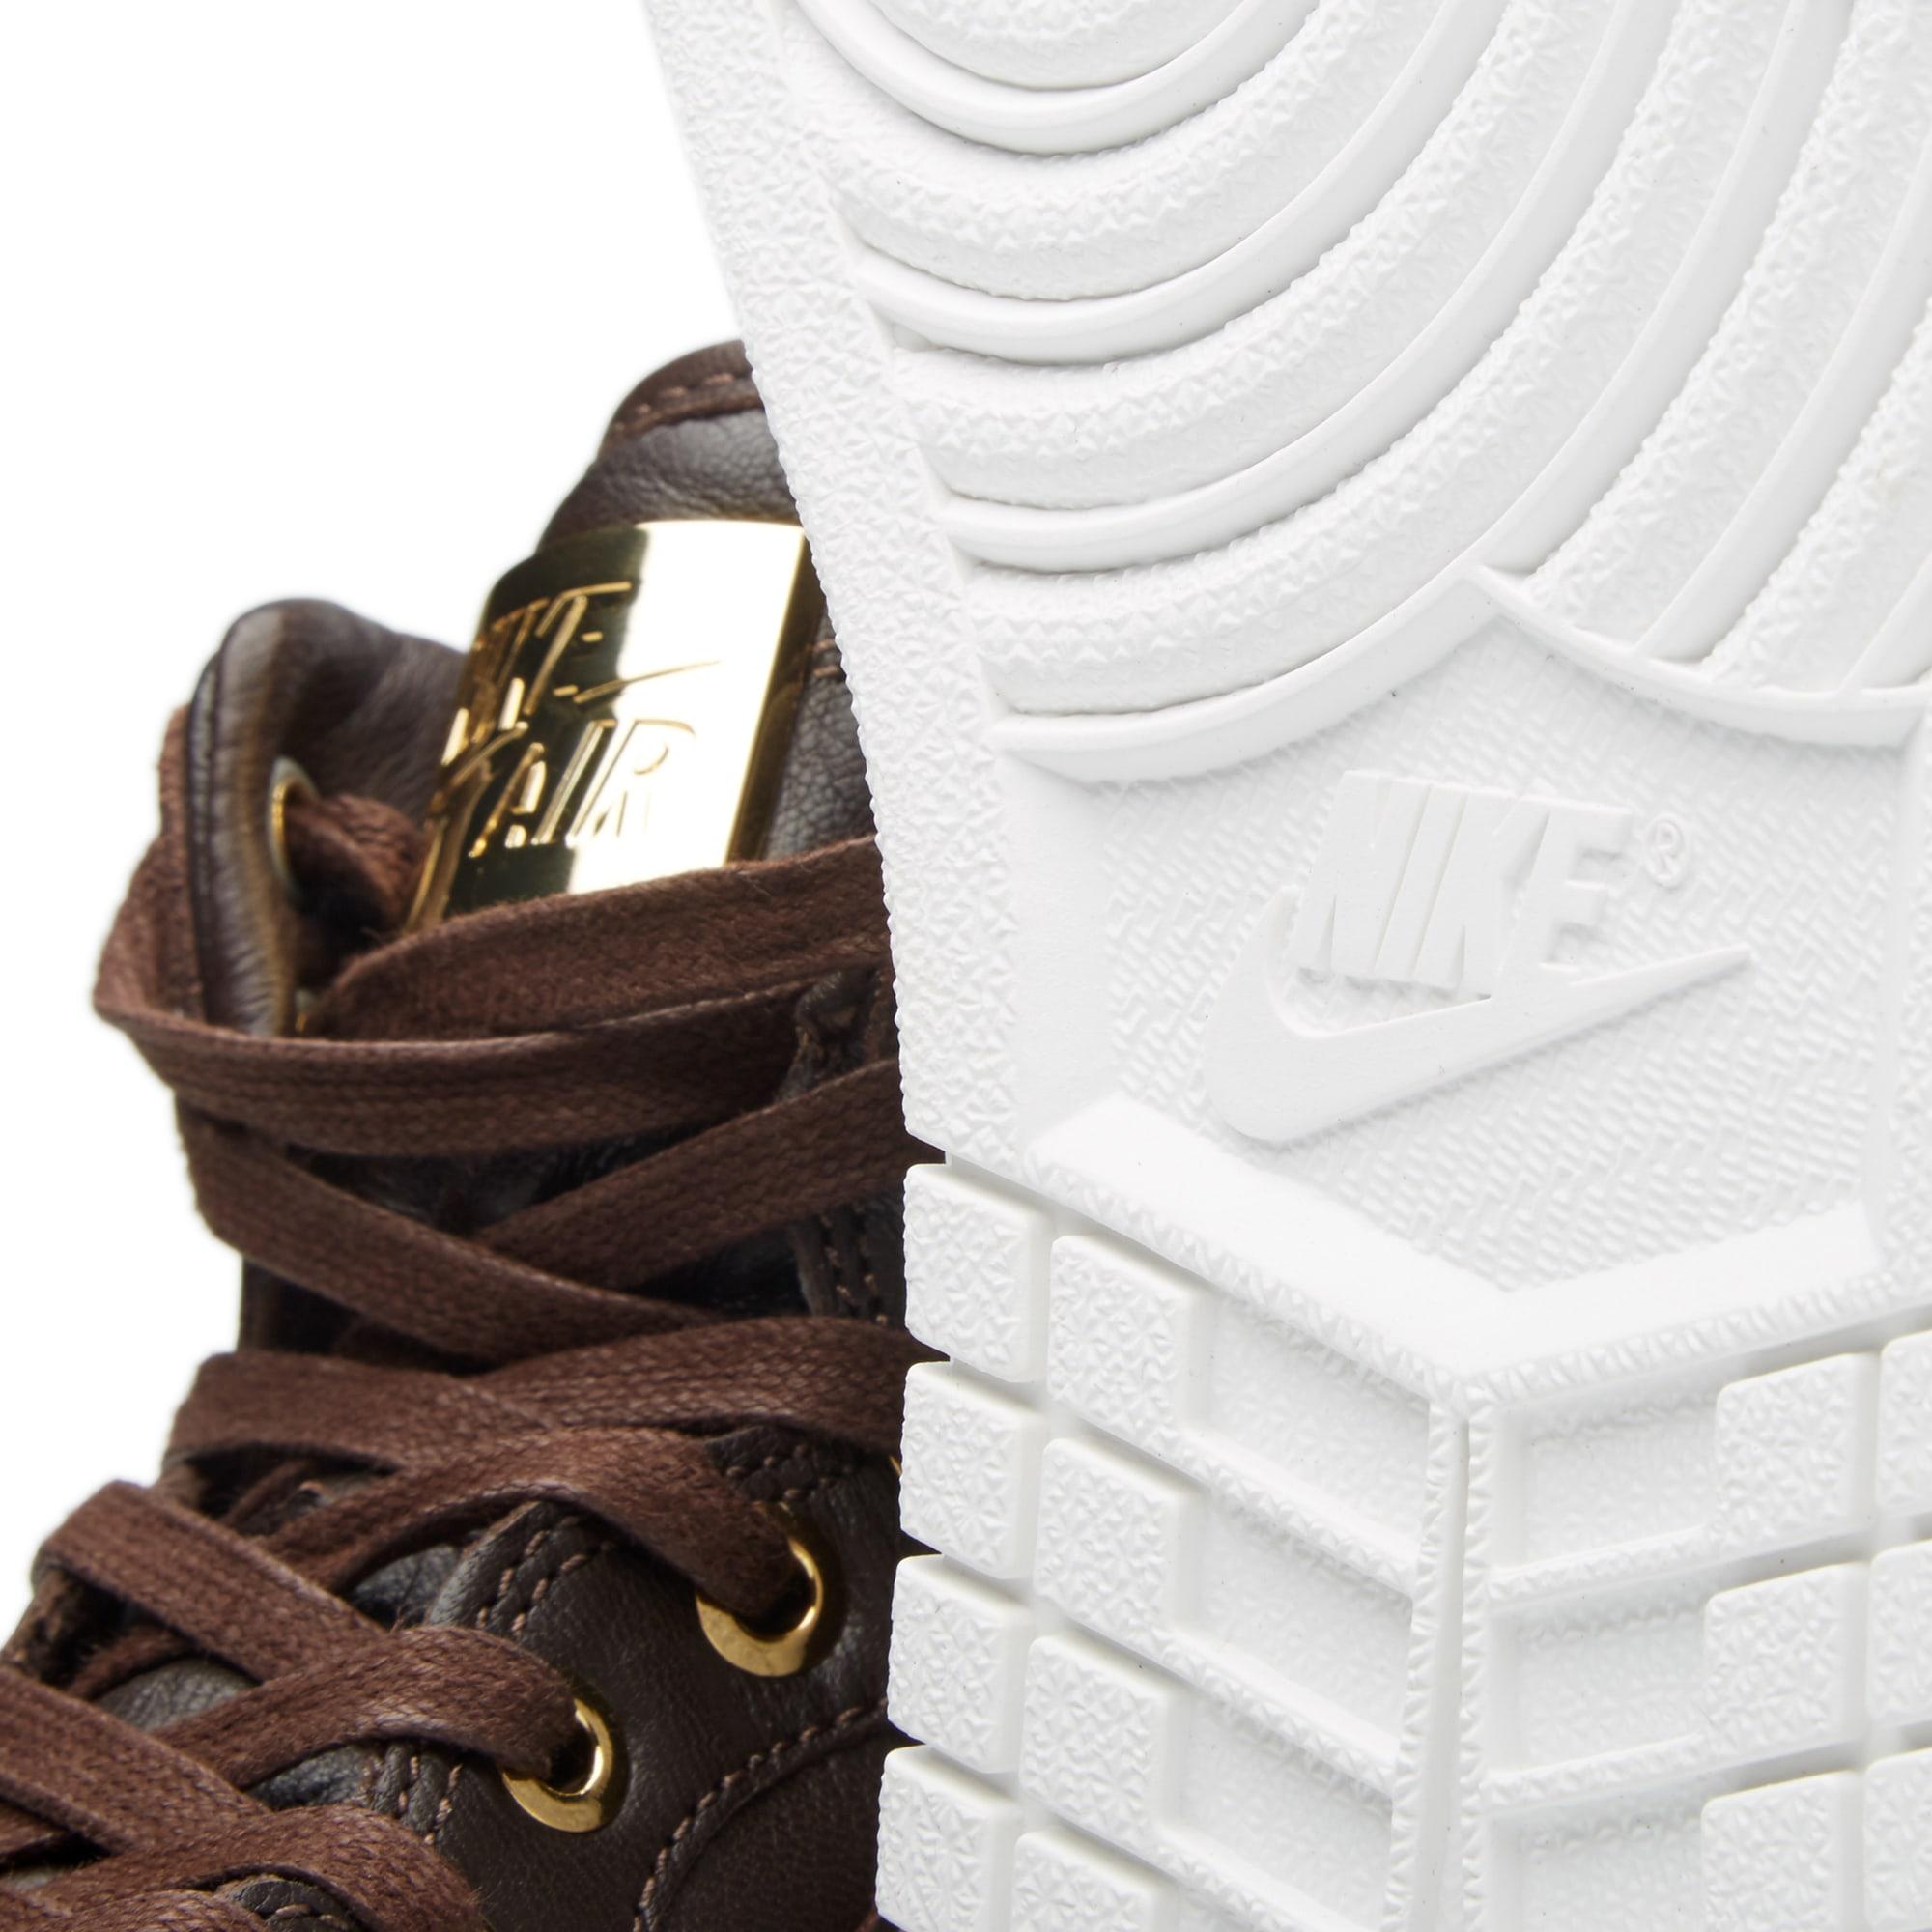 b702b1936f9947 Nike Air Jordan 1 Pinnacle Baroque Brown   Metallic Gold